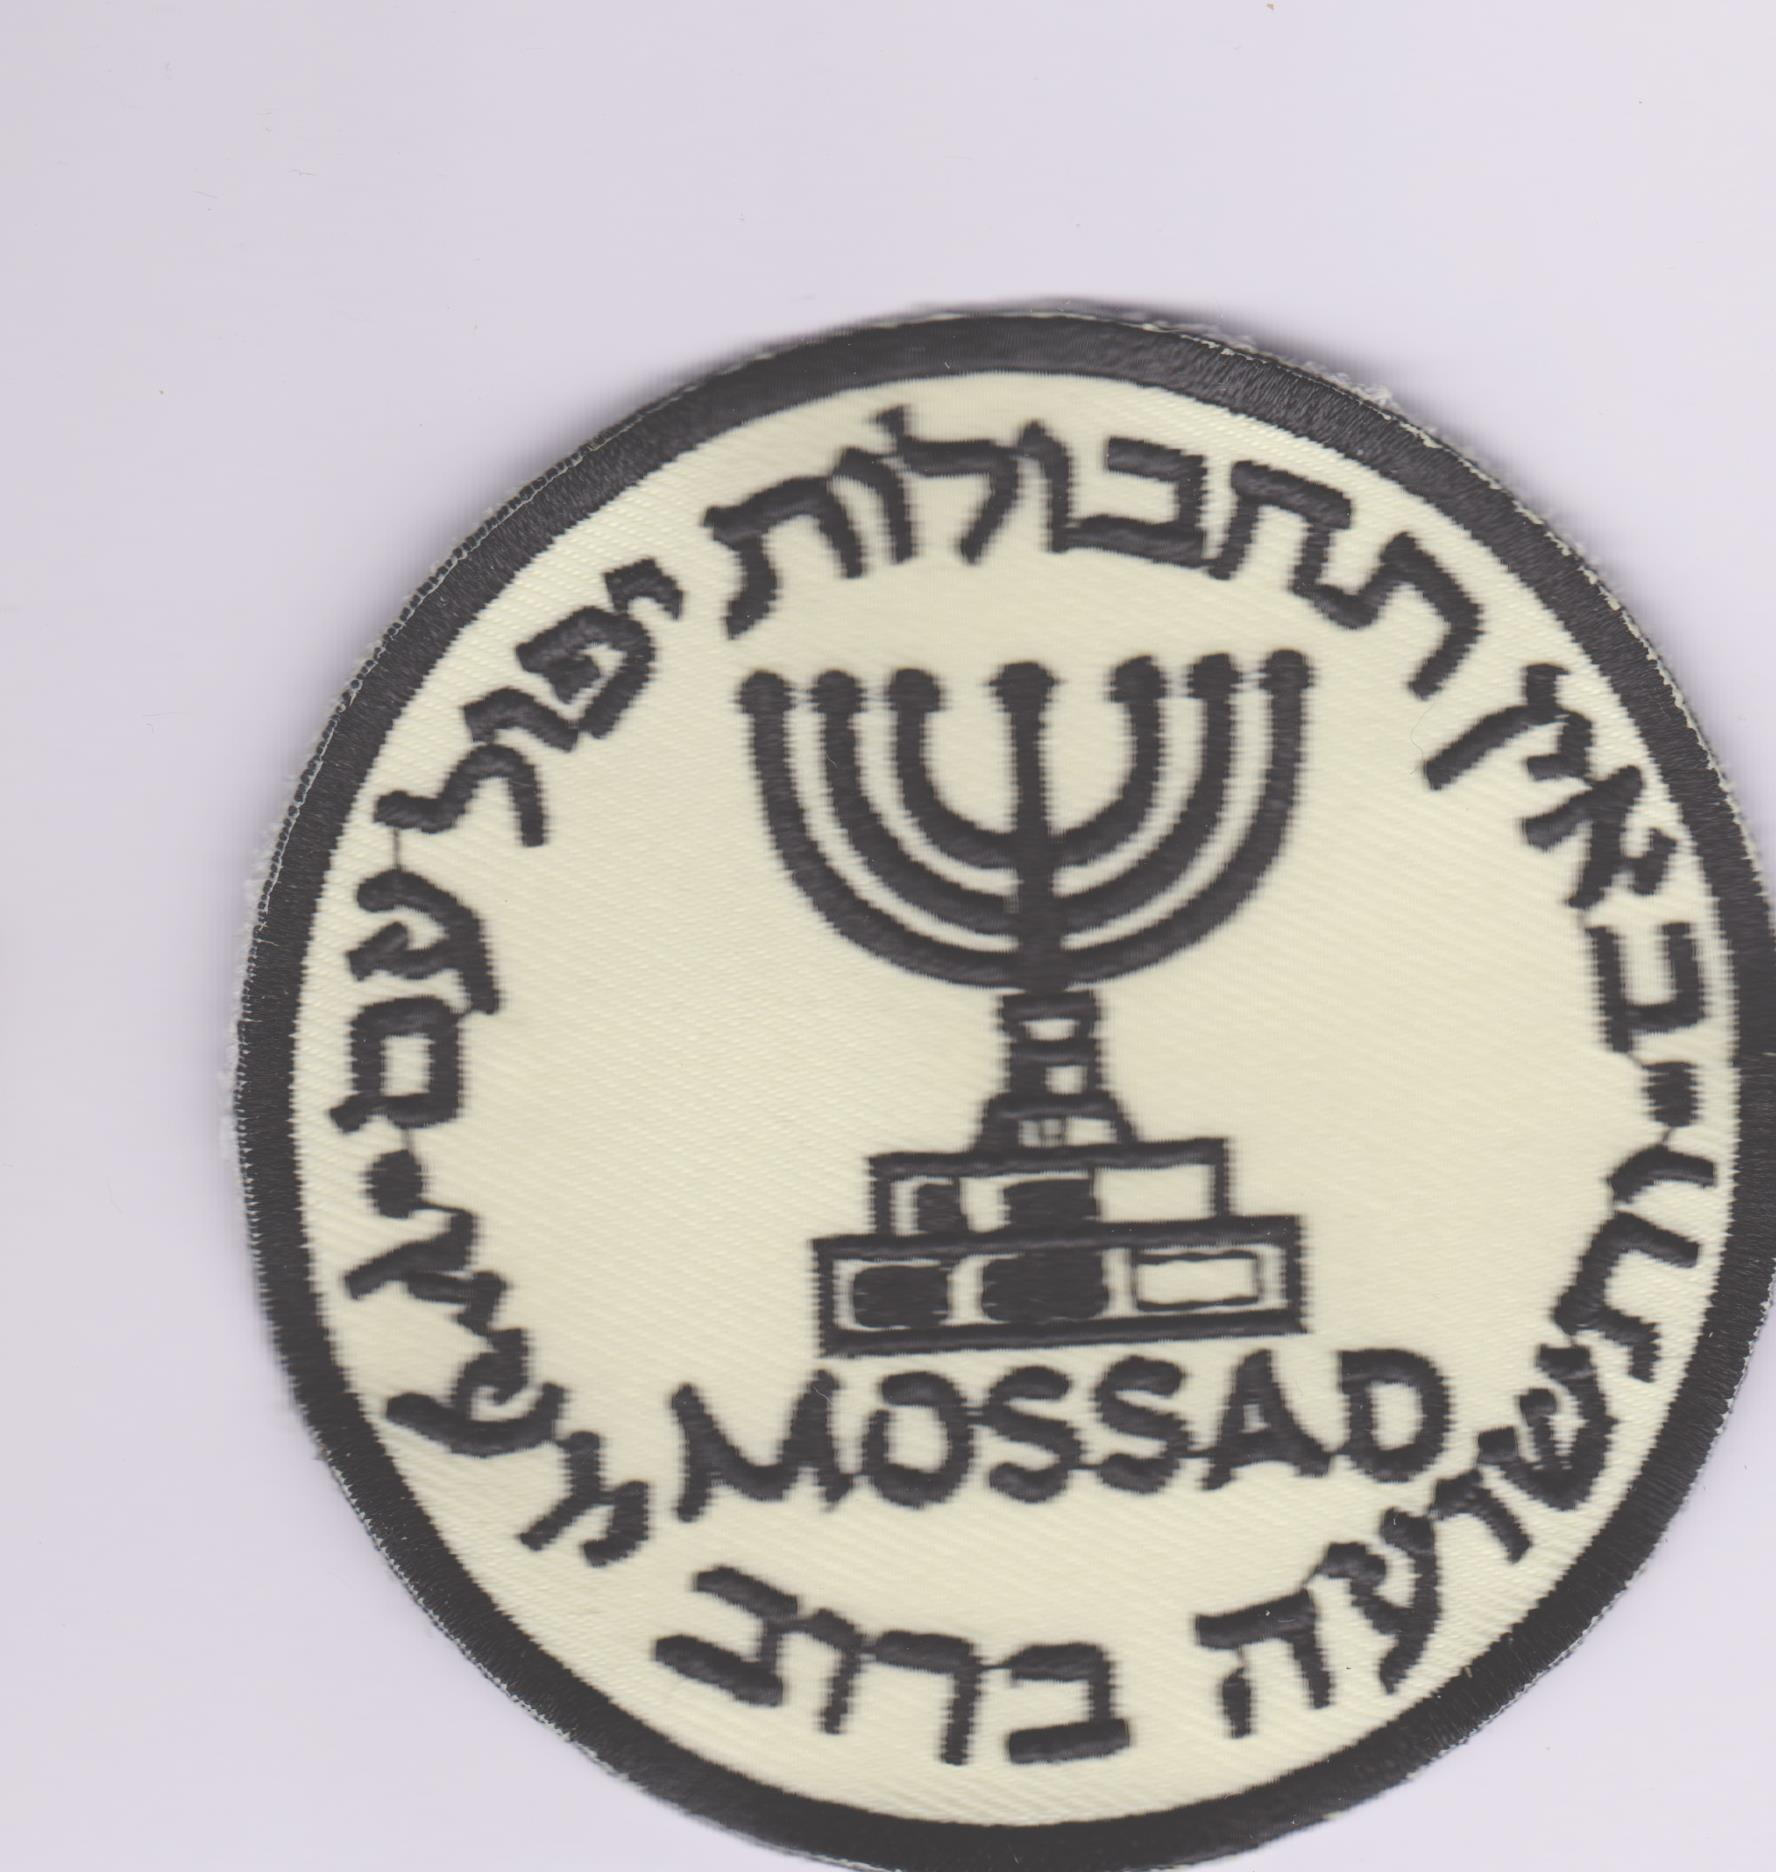 Israeli Secret Intelligence Service MOSSAD badge